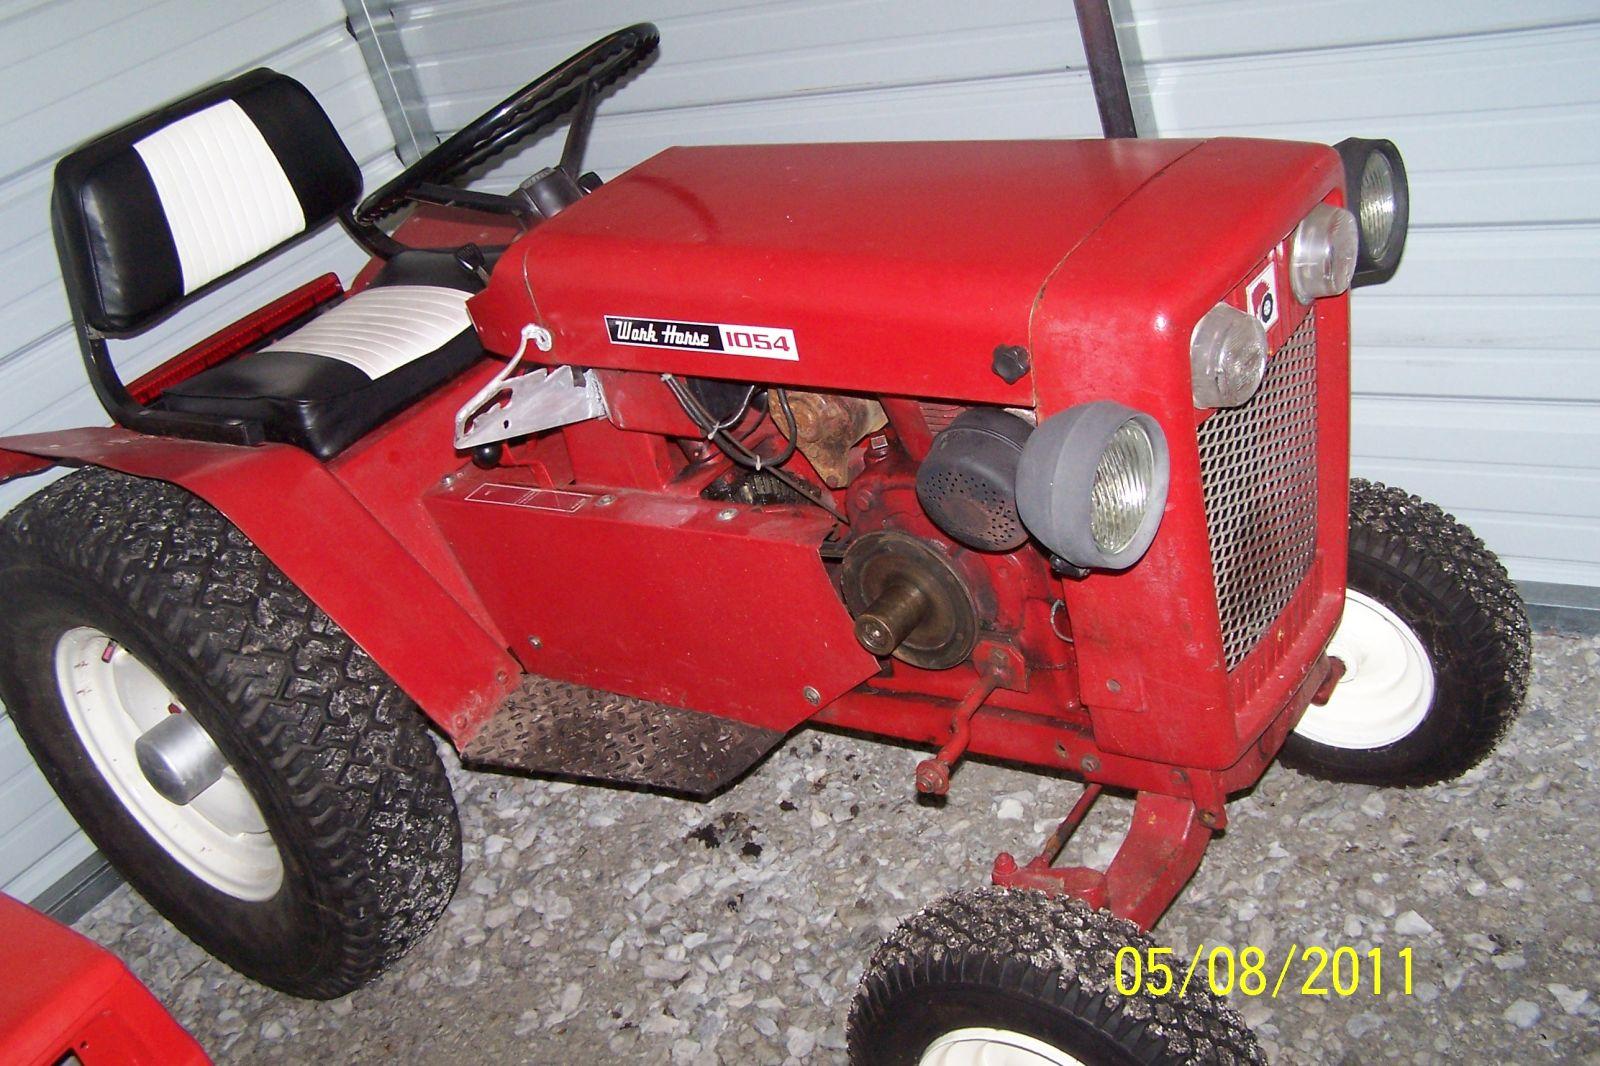 1964 Wheel Horse 1054 Tractor